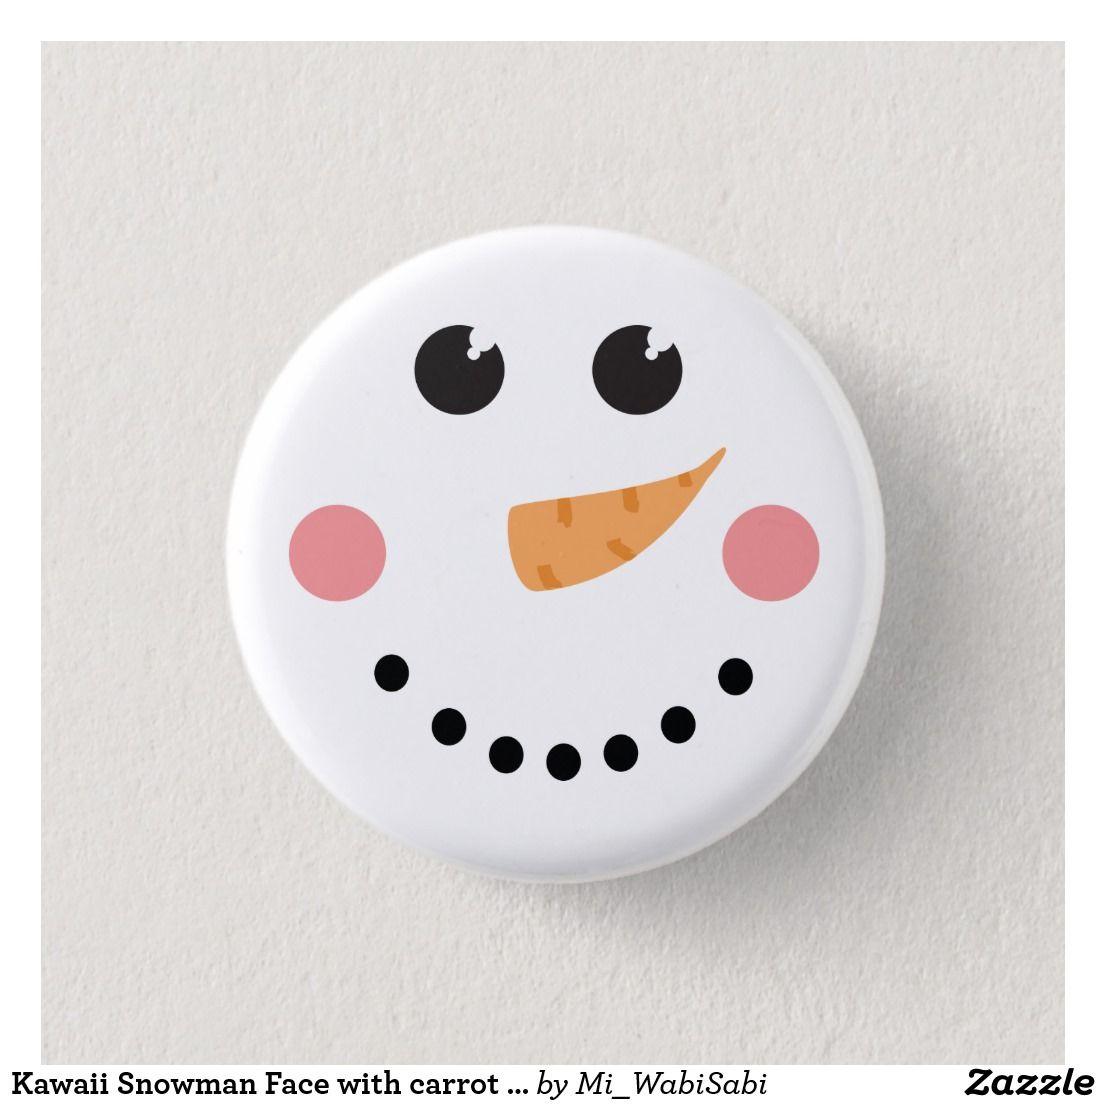 Kawaii Snowman Face with carrot nose Button